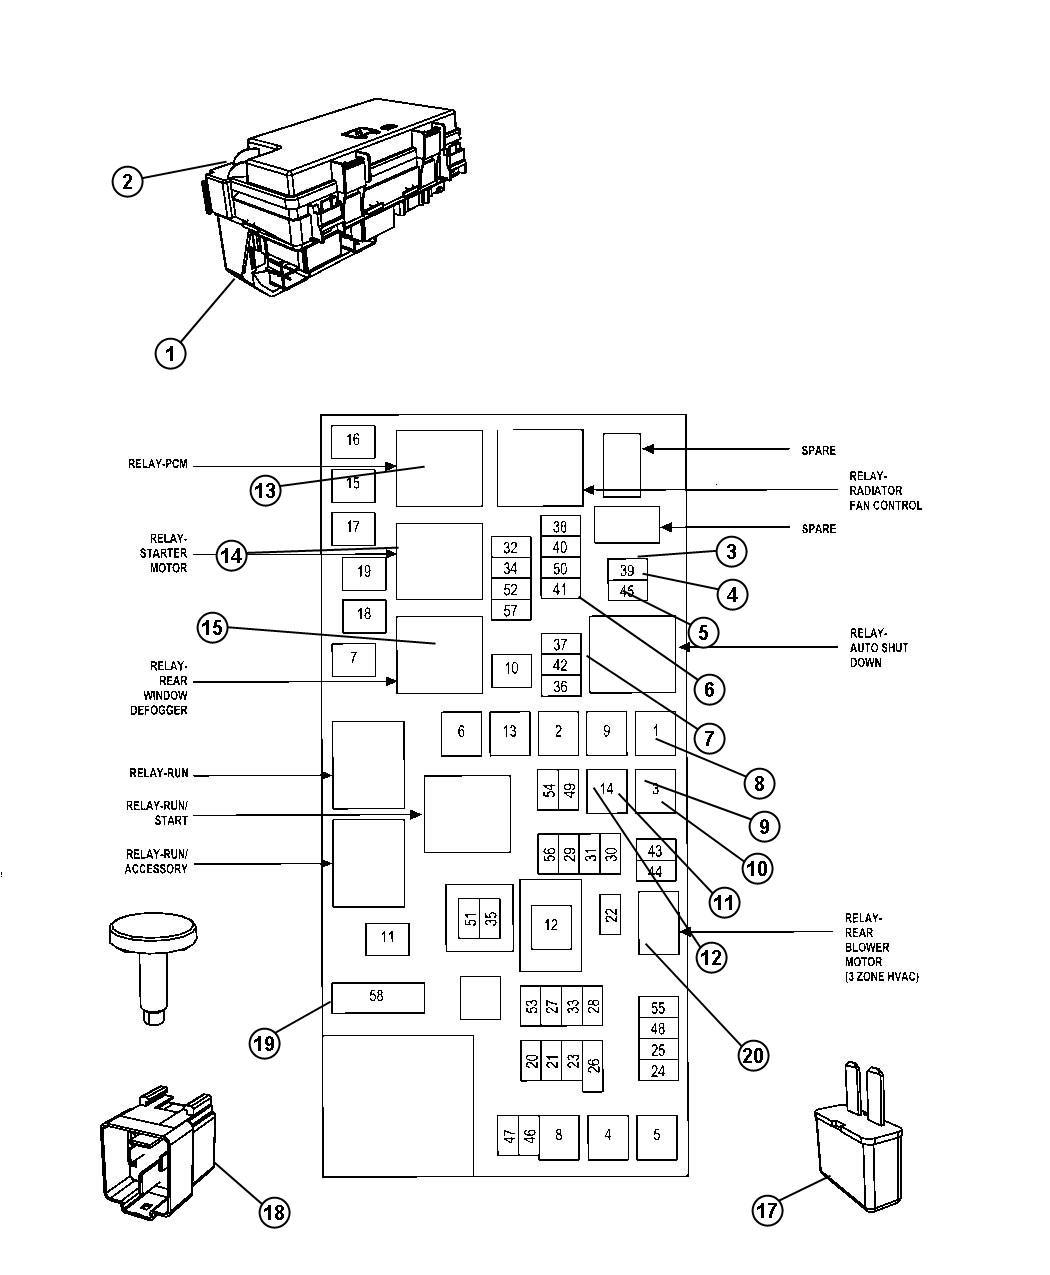 2014 dodge ram factory radio wiring diagram